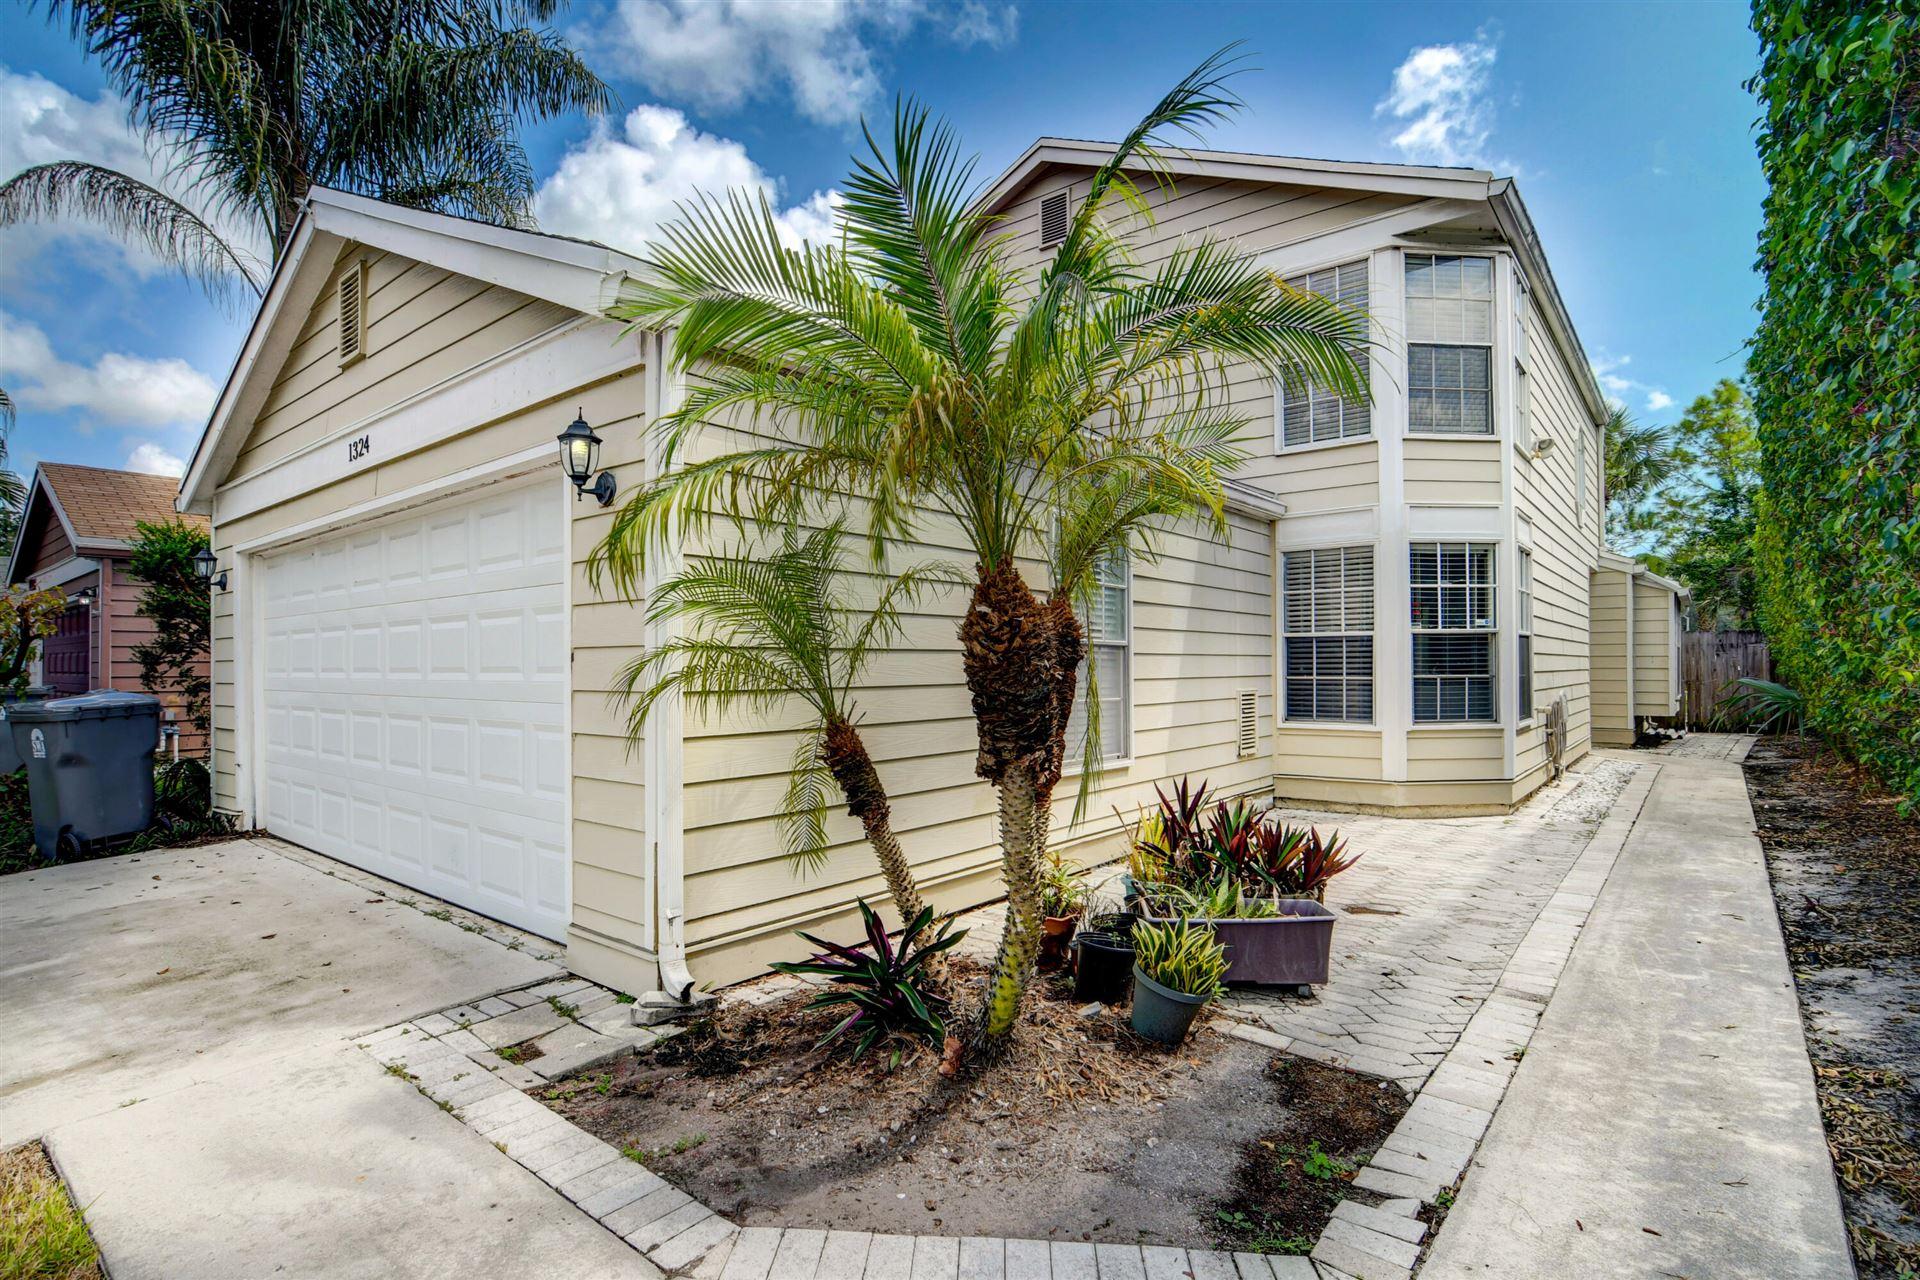 1324 Strawberry Lane, West Palm Beach, FL 33415 - MLS#: RX-10745798